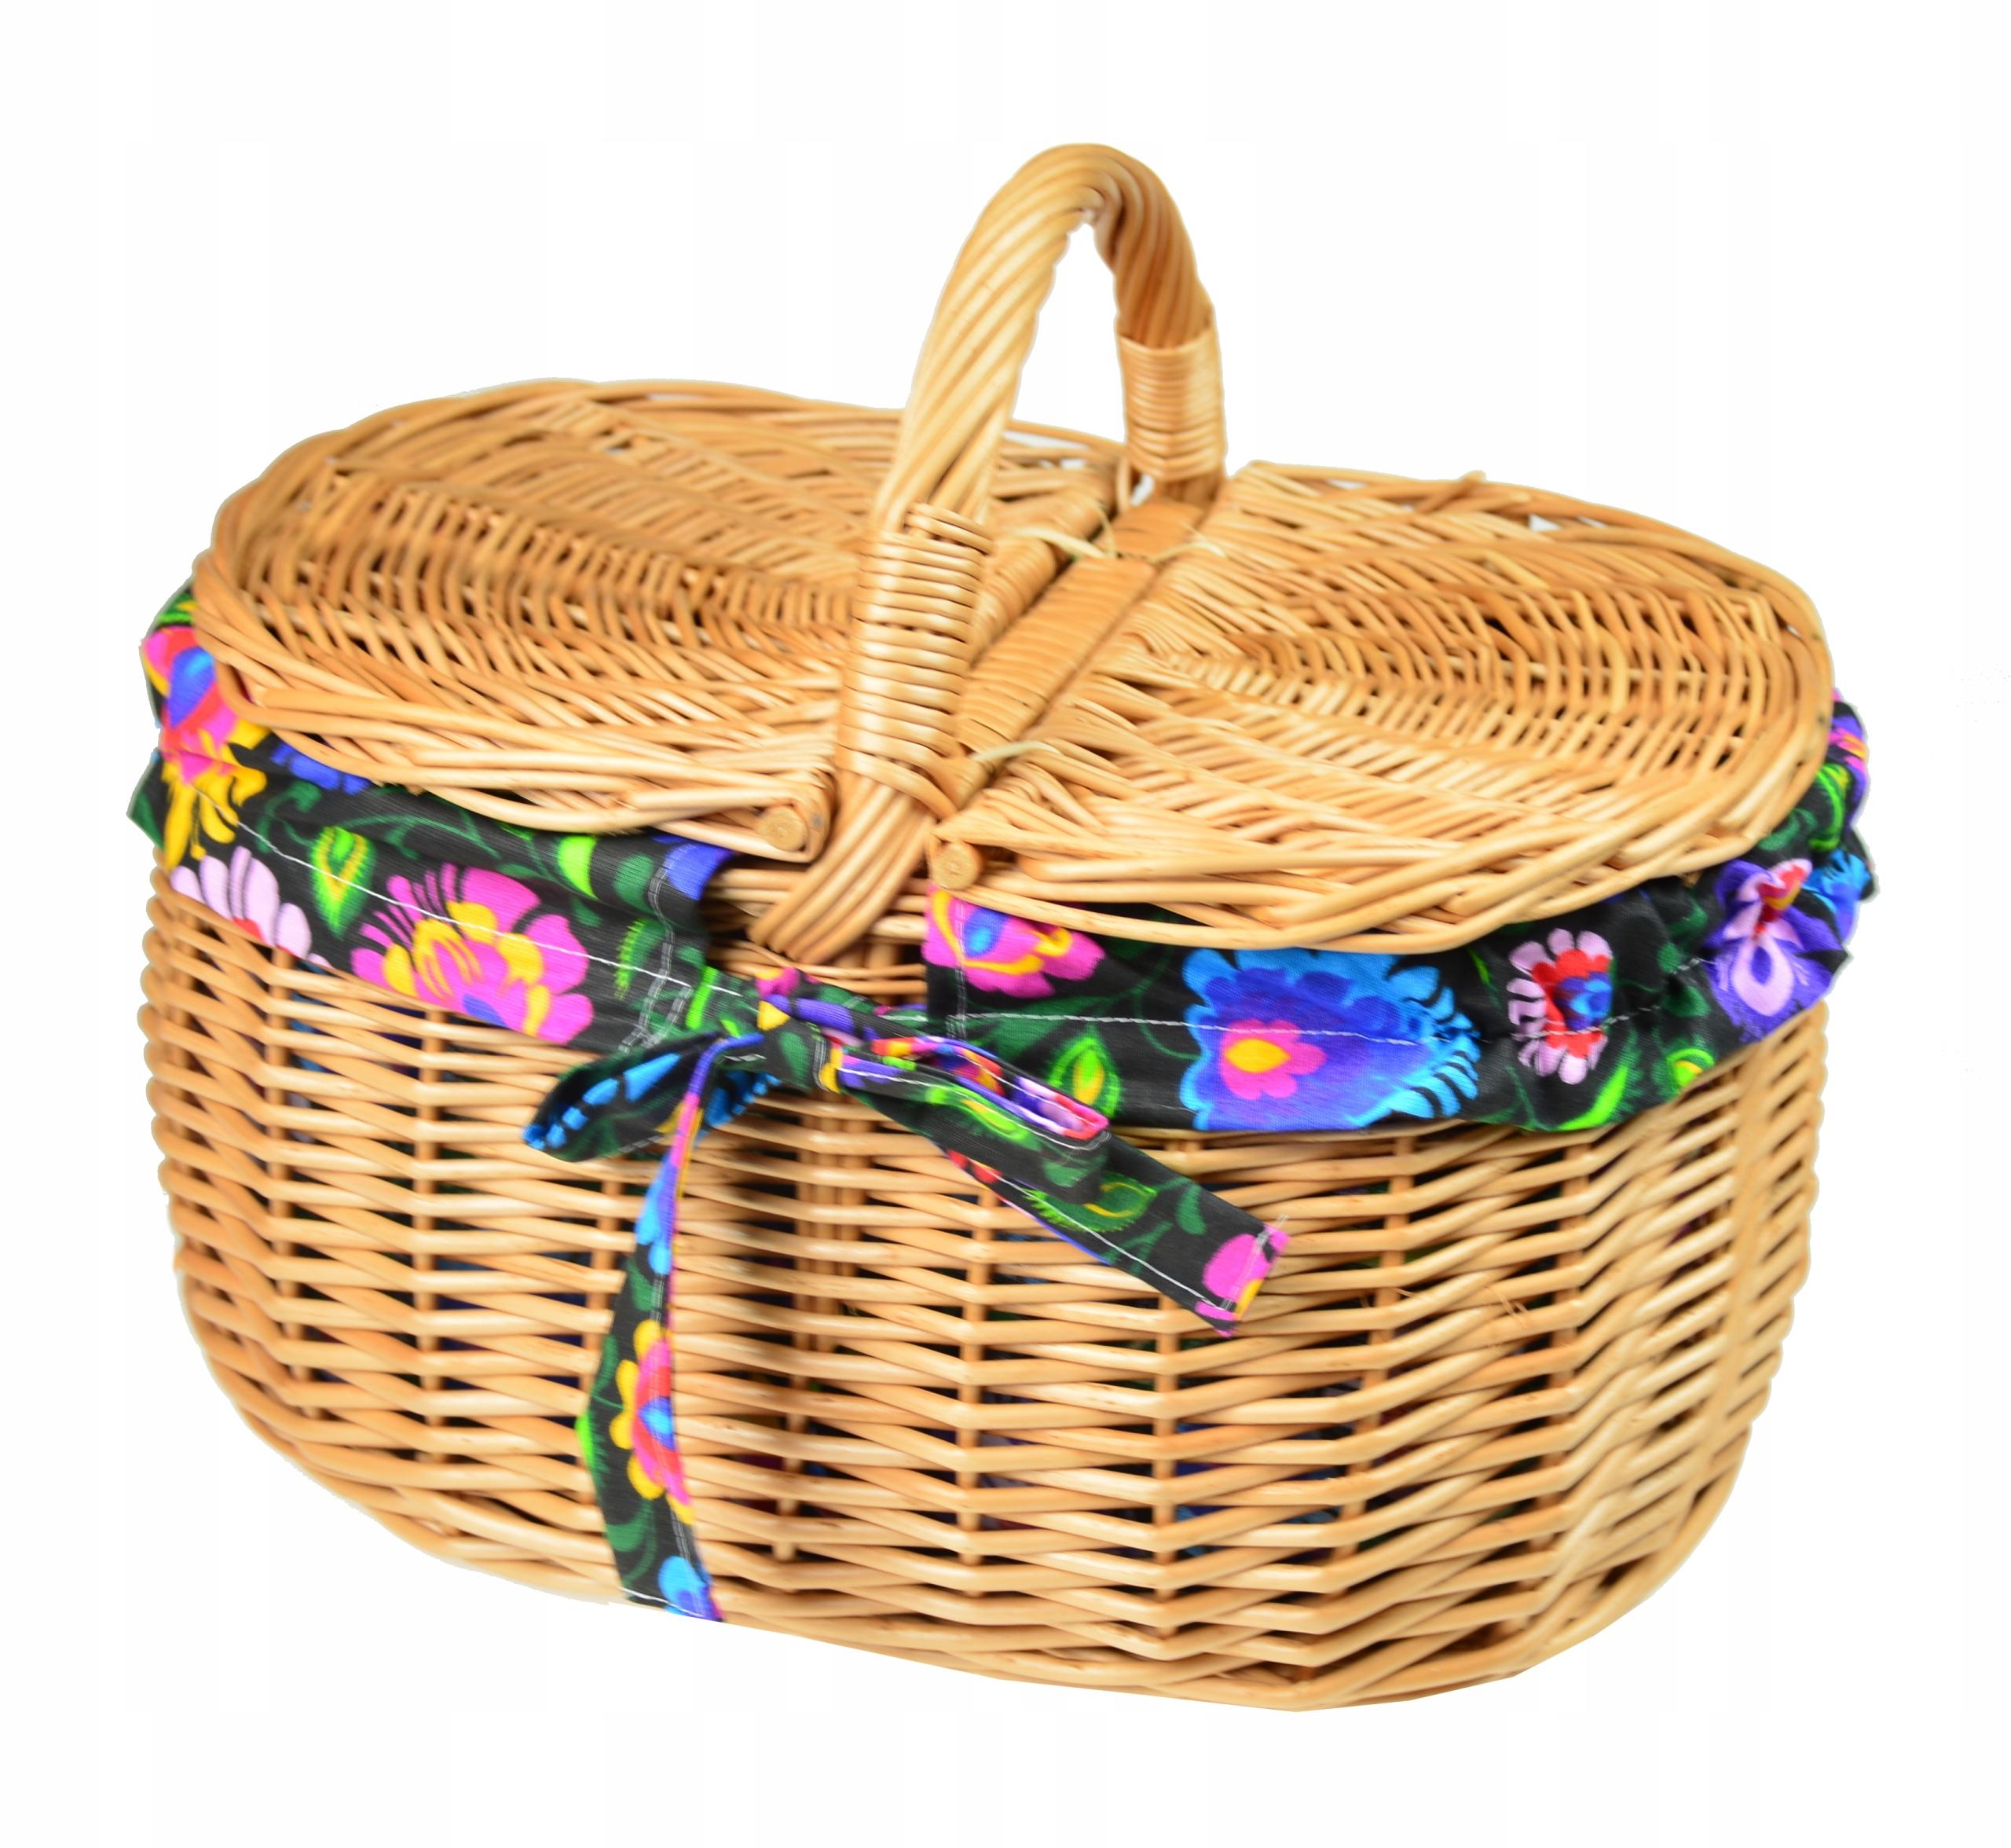 PICNIC BASKET плетеная корзина для пикника размер. Л.